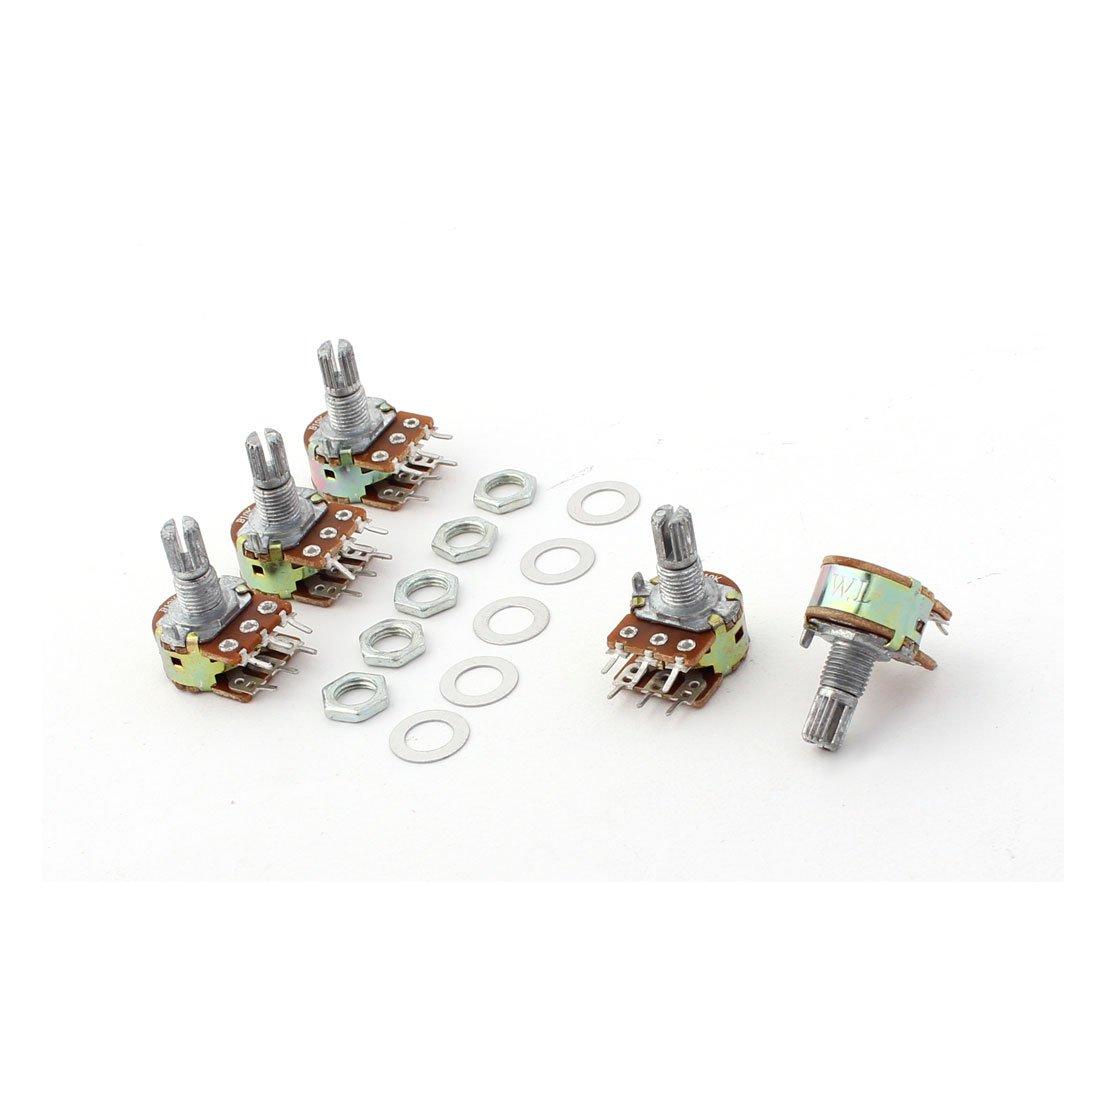 Sourcingmap 10 kOhm 6 Pins Split Shaft Rotary Linear Dual Taper Potentiometer - Silver (5-Piece) a12091800ux0706